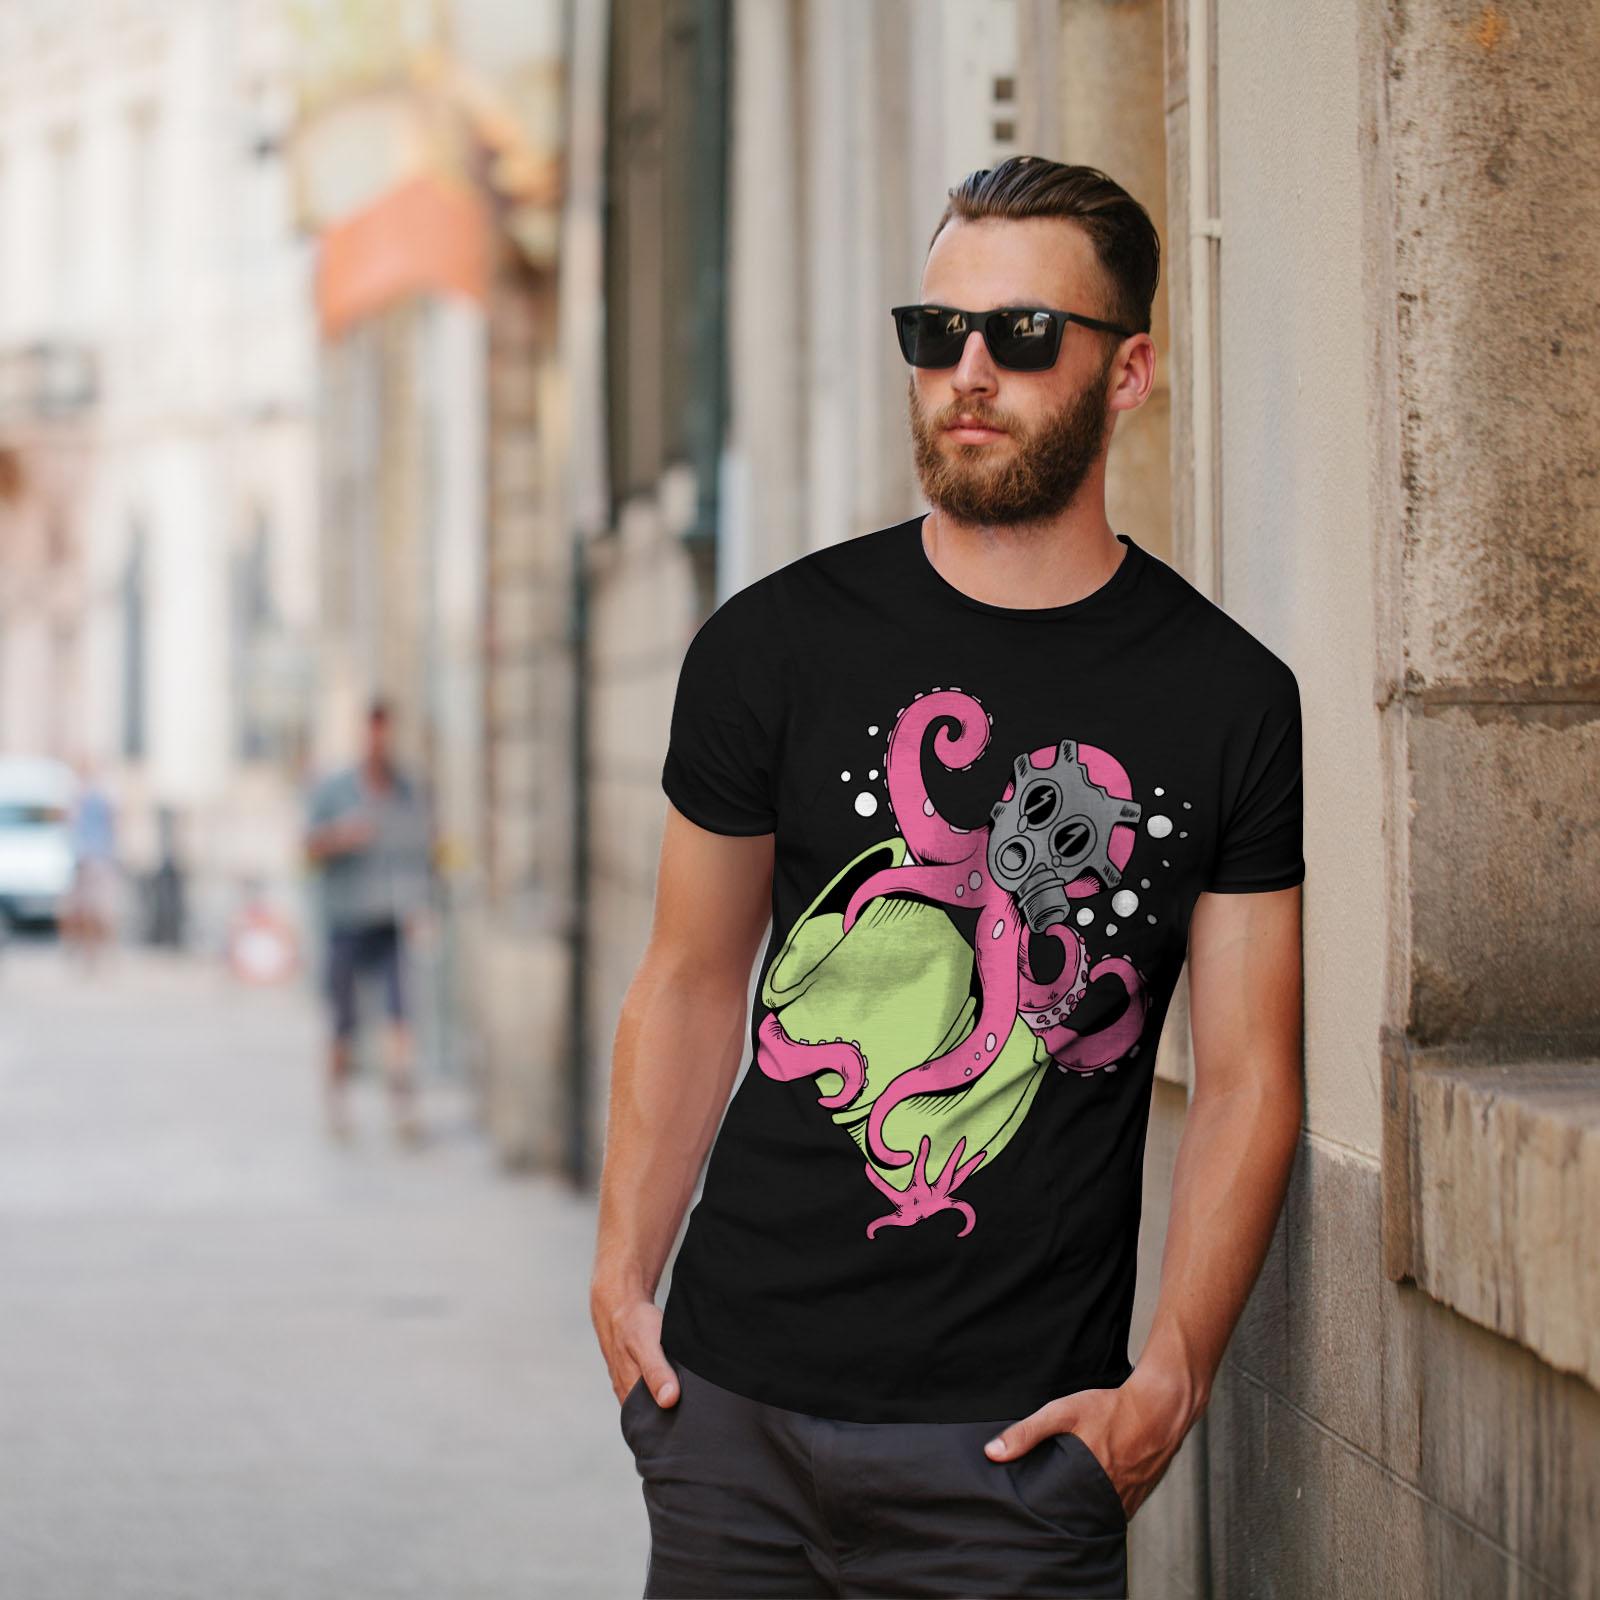 Wellcoda Octopus Cartoon Fantasy Mens T-shirt Toxic Graphic Design Printed Tee